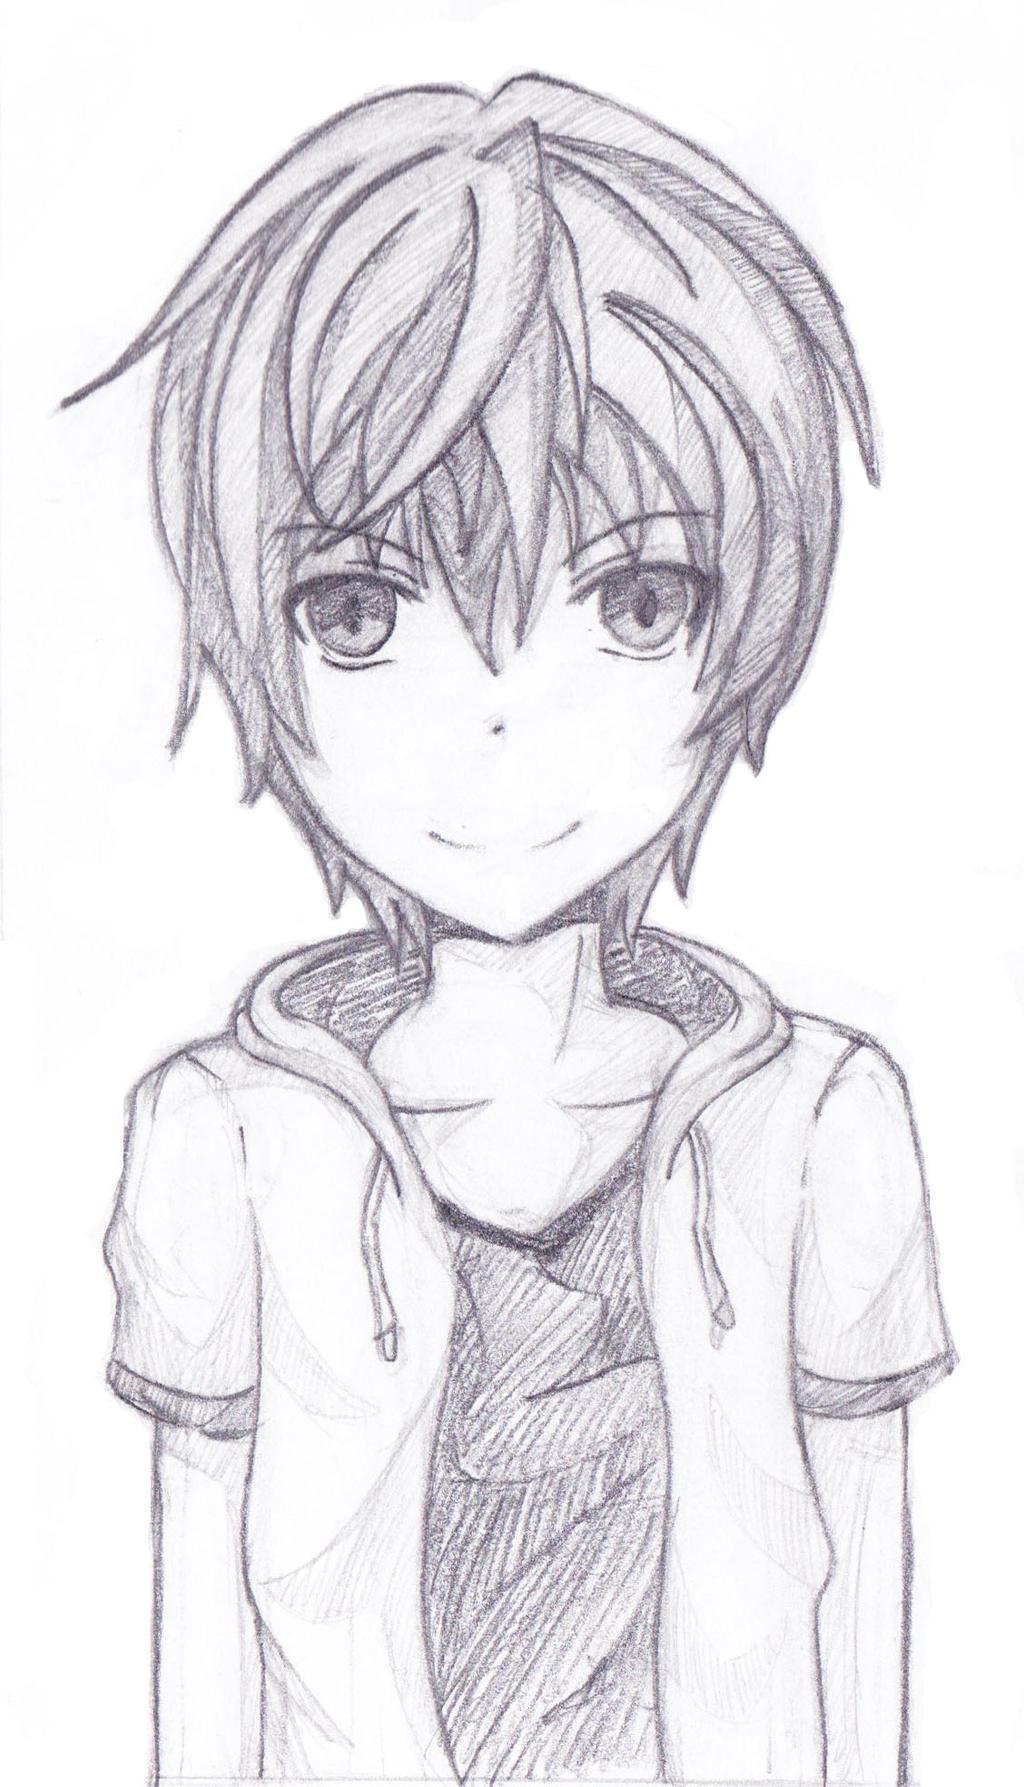 Sketch Of An Anime Boy By Blazing Skies On Deviantart